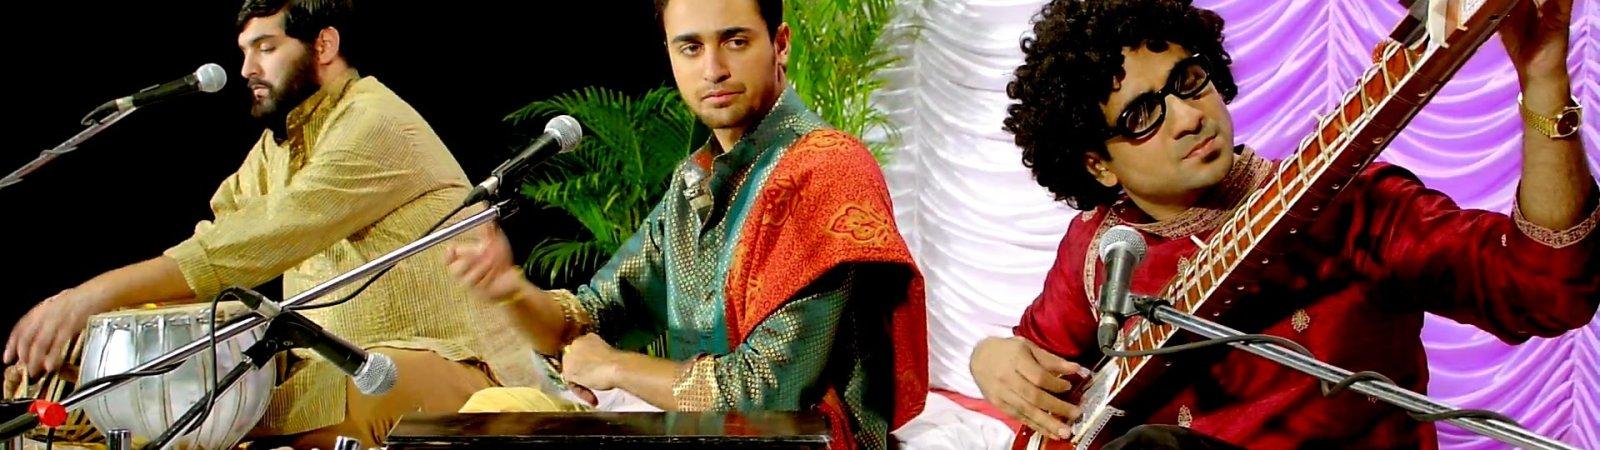 Photo dernier film Abhinay Deo